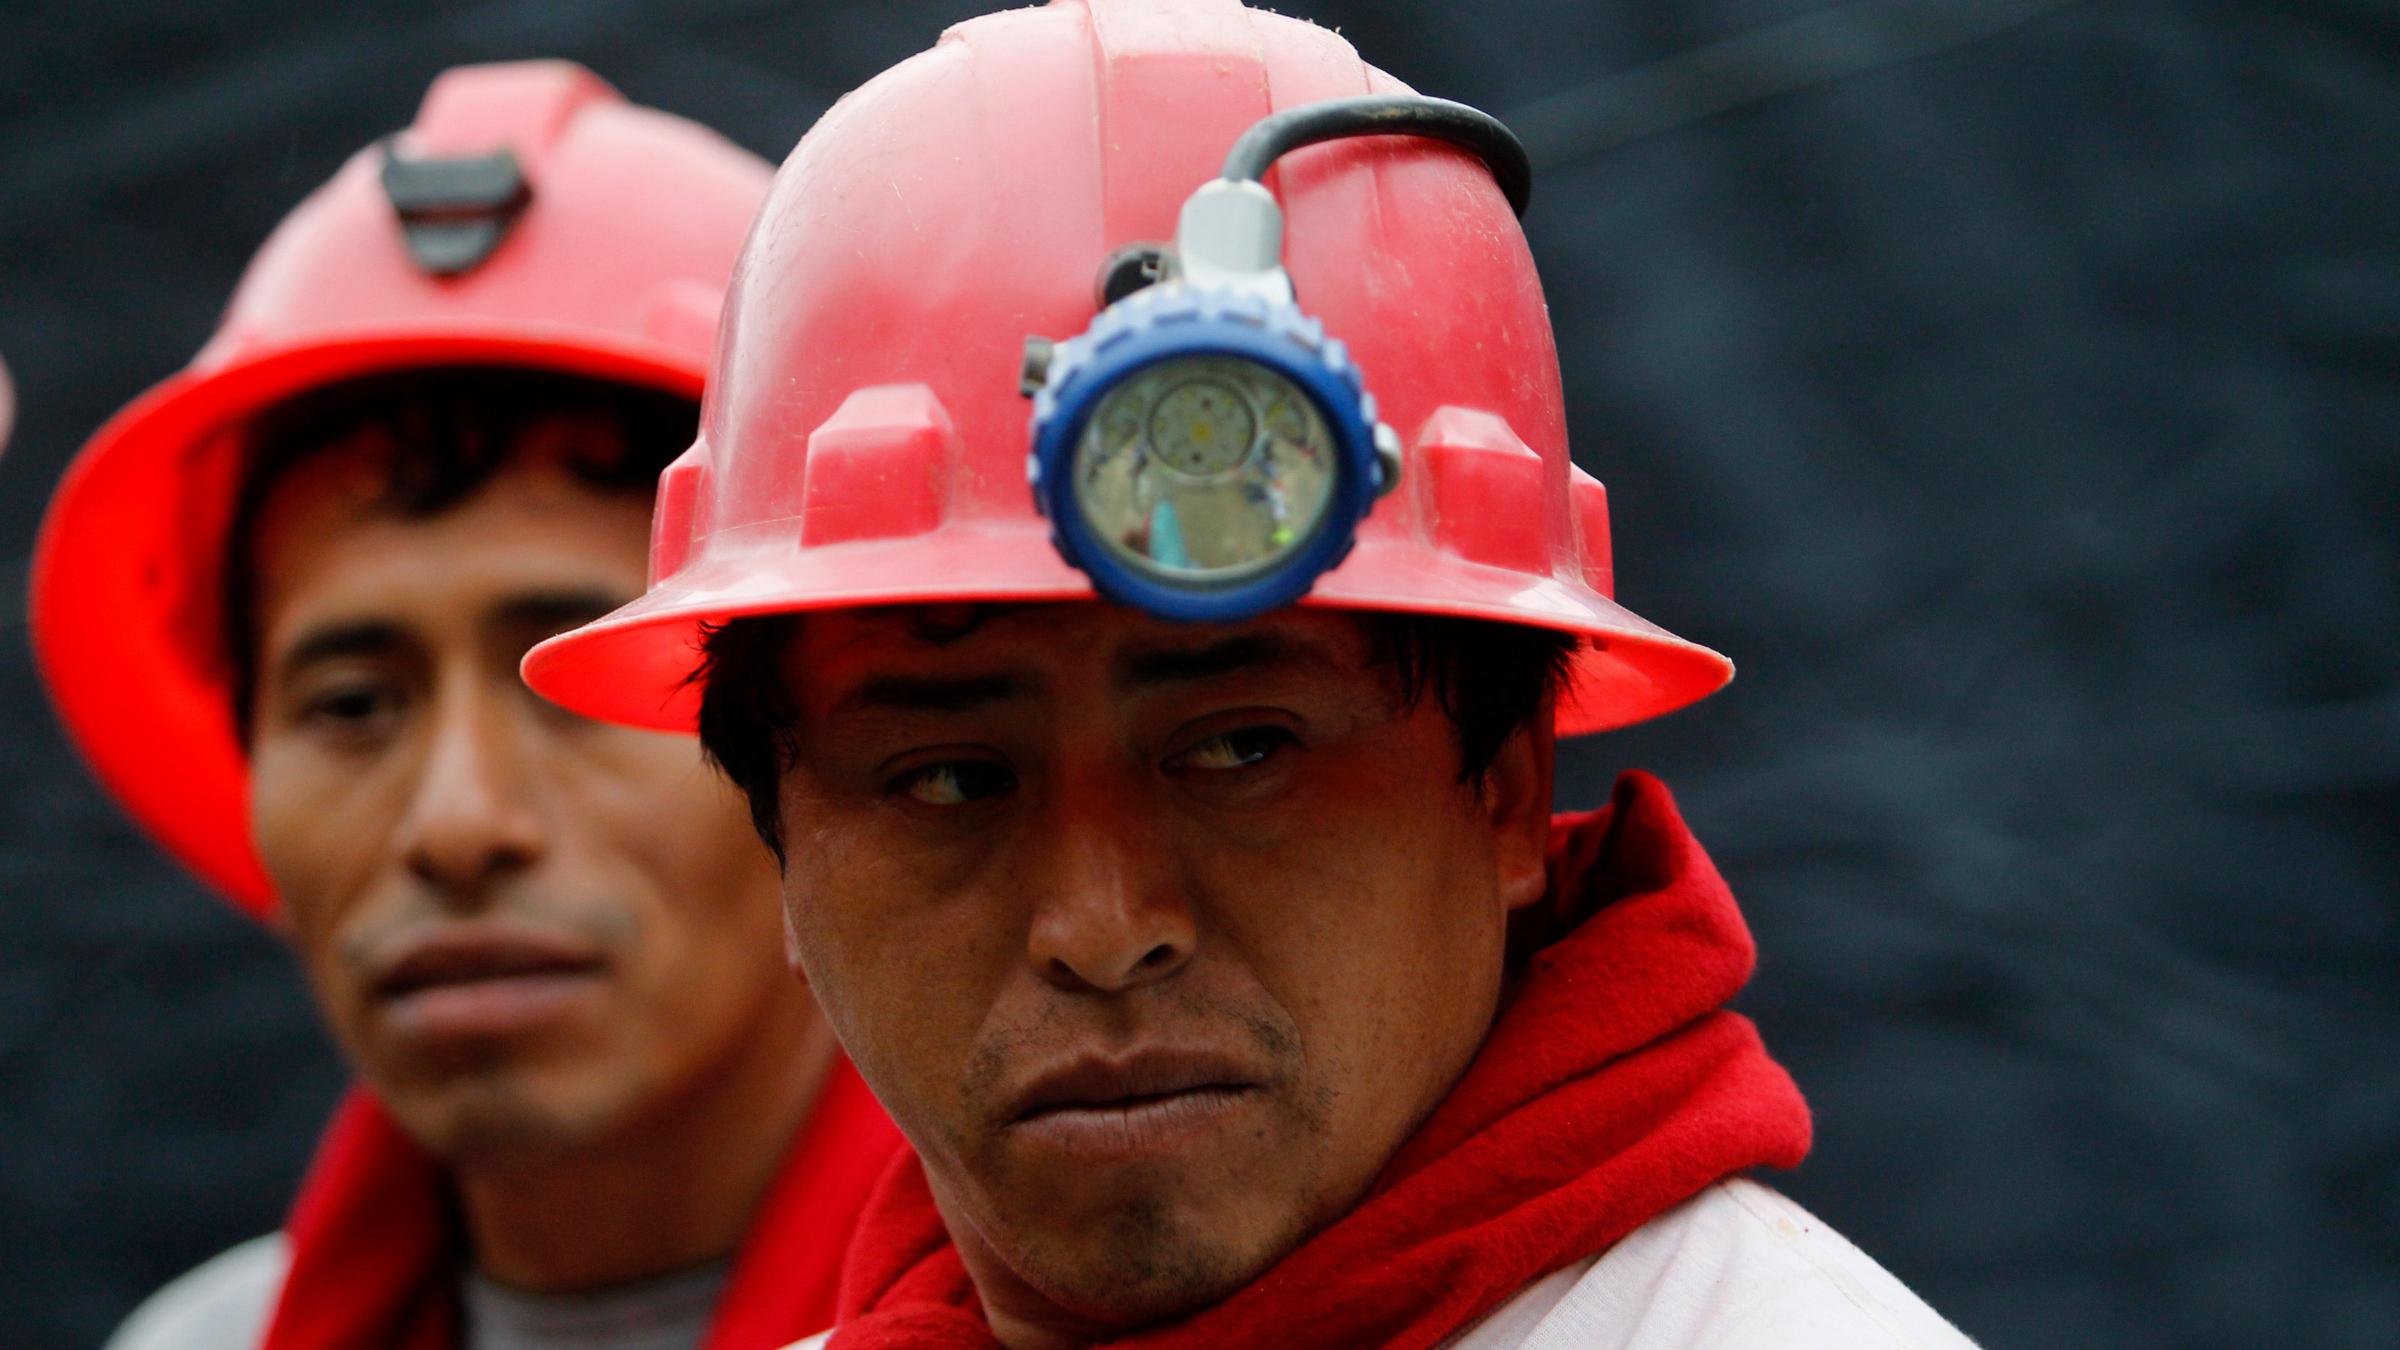 Peru gold mining